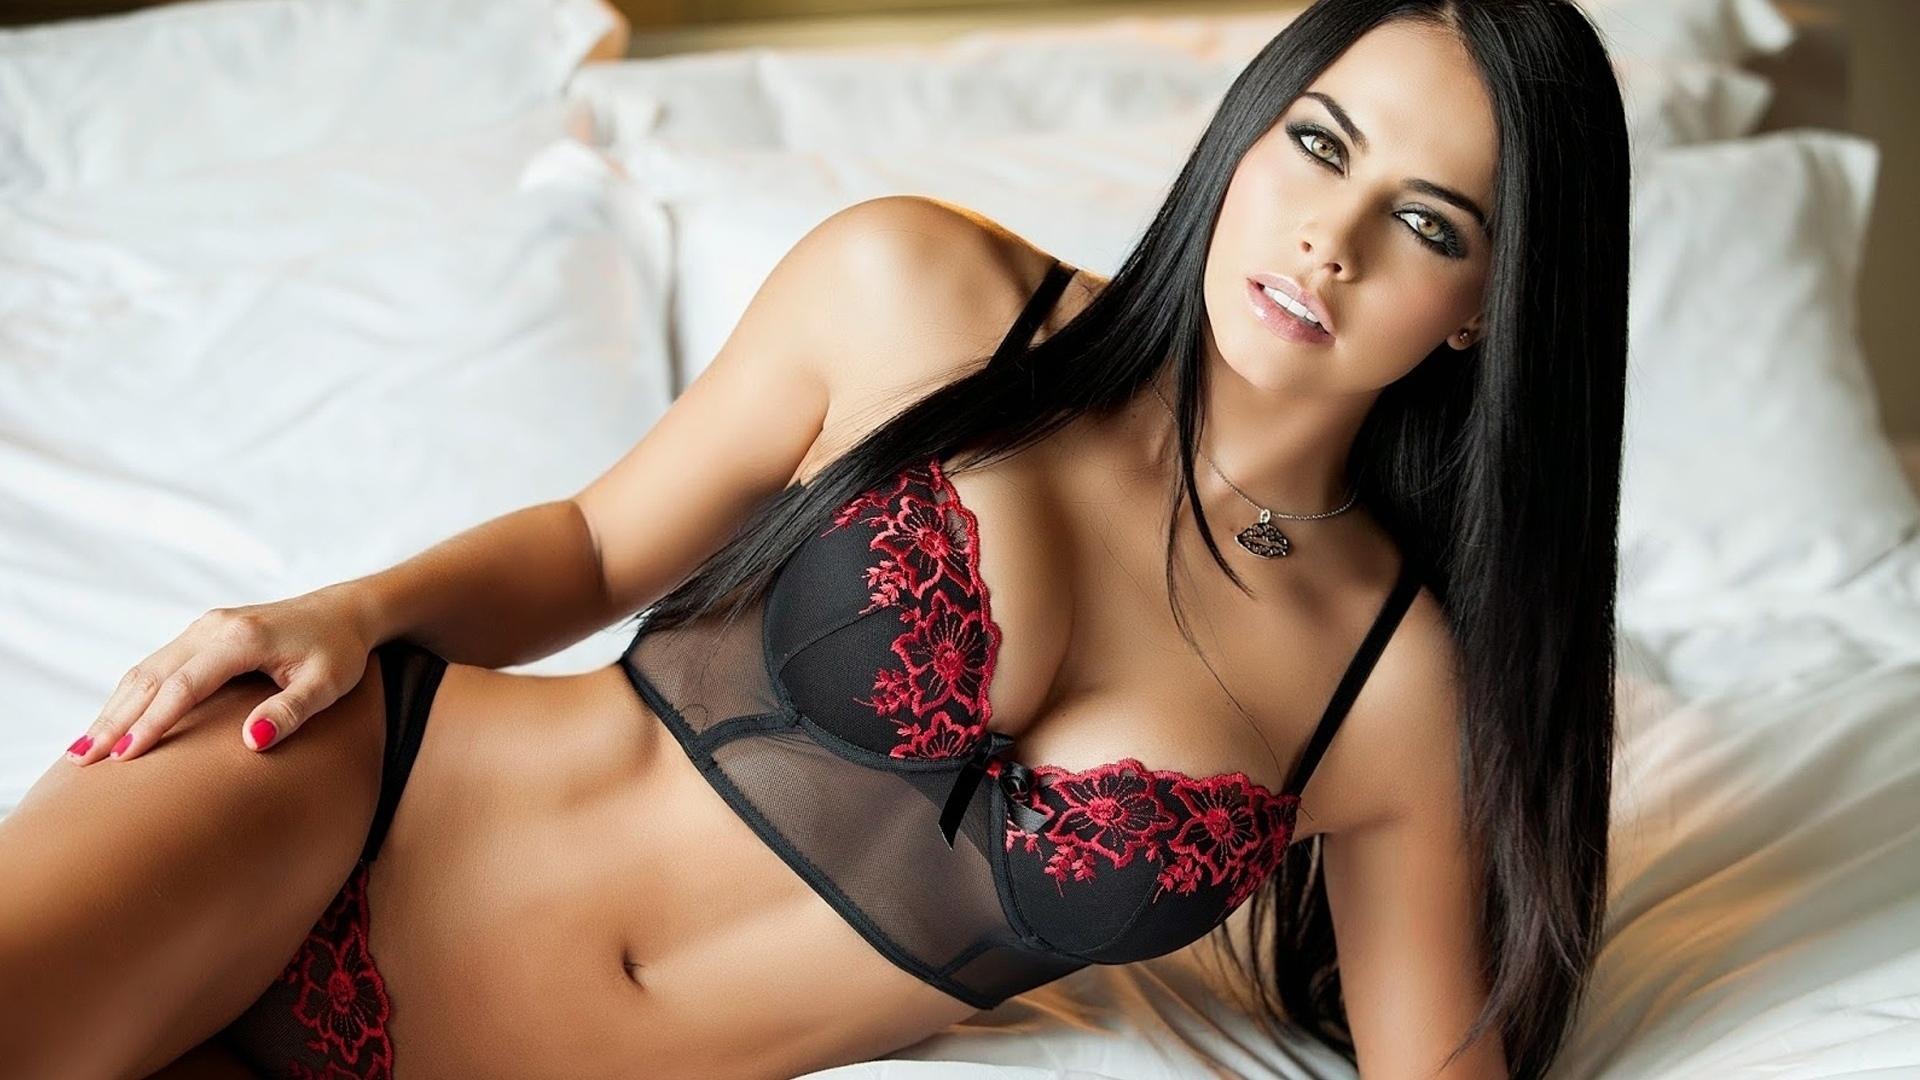 michelle sarmiento, красивая, прелесть, милашка, брюнетка, тело, фиура, бельё, бюстгальтер, кулон